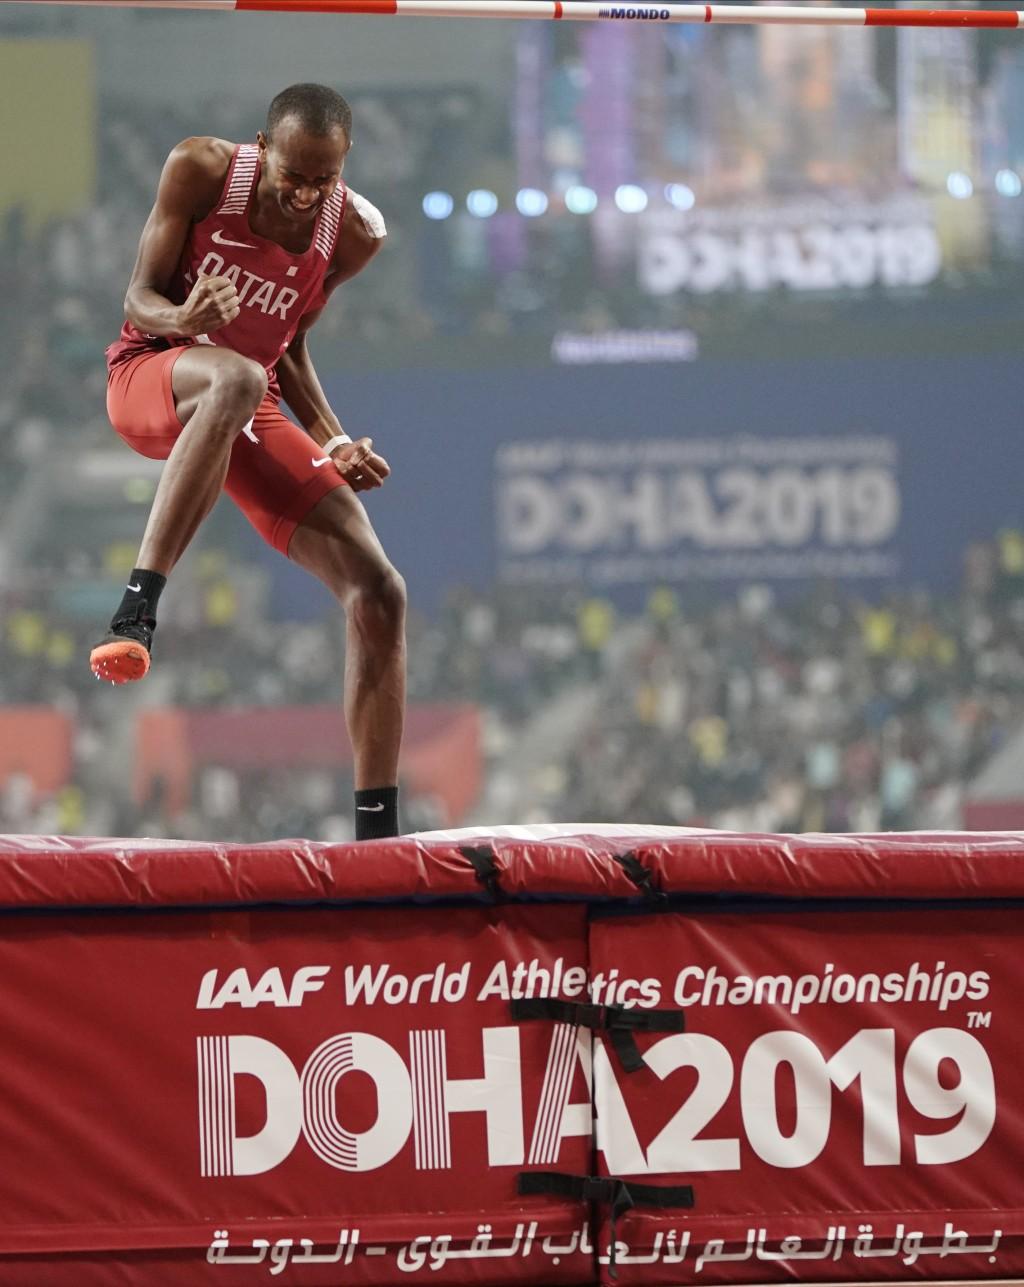 Gold medalist Mutaz Essa Barshim, of Qatar, celebrates after the men's high jump final at the World Athletics Championships in Doha, Qatar, Friday, Oc